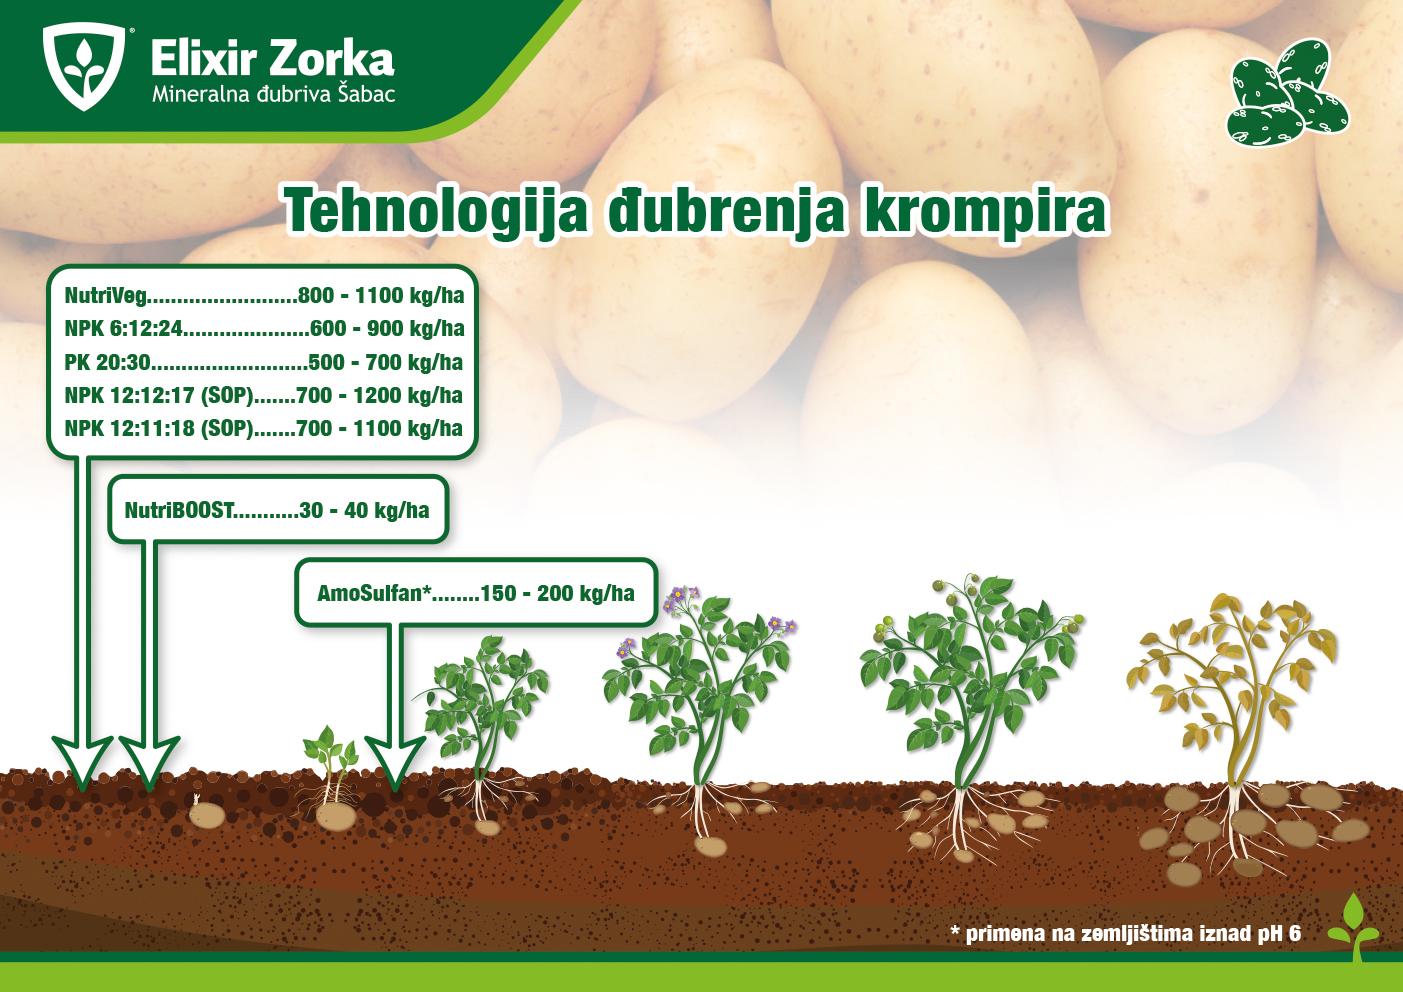 Tehnologija đubrenja krompira